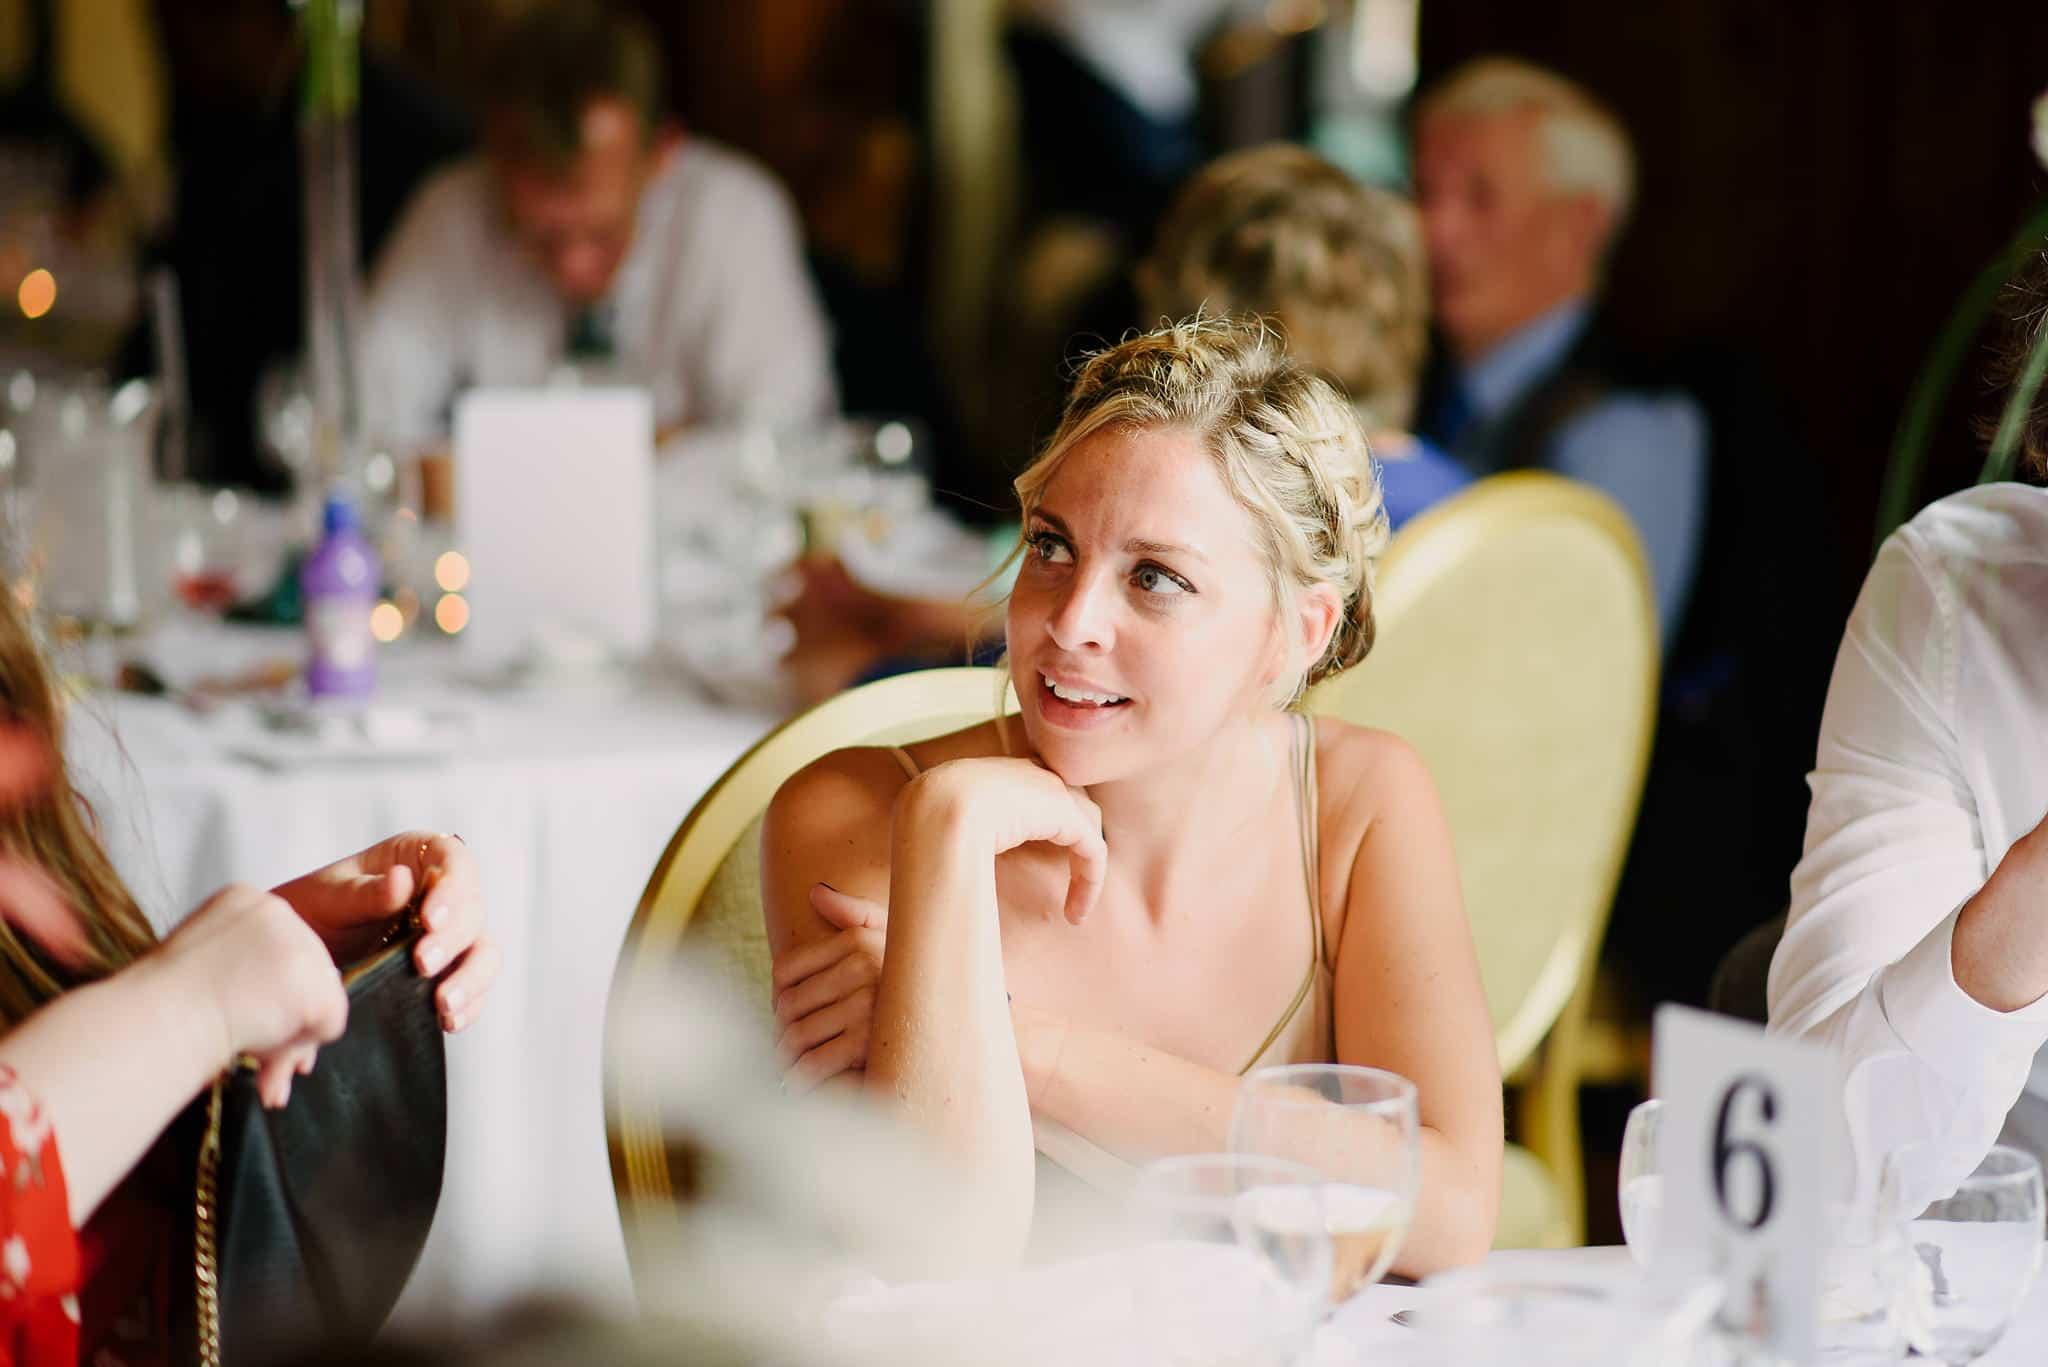 Tom & Amelia - Sprowston Manor Wedding 21